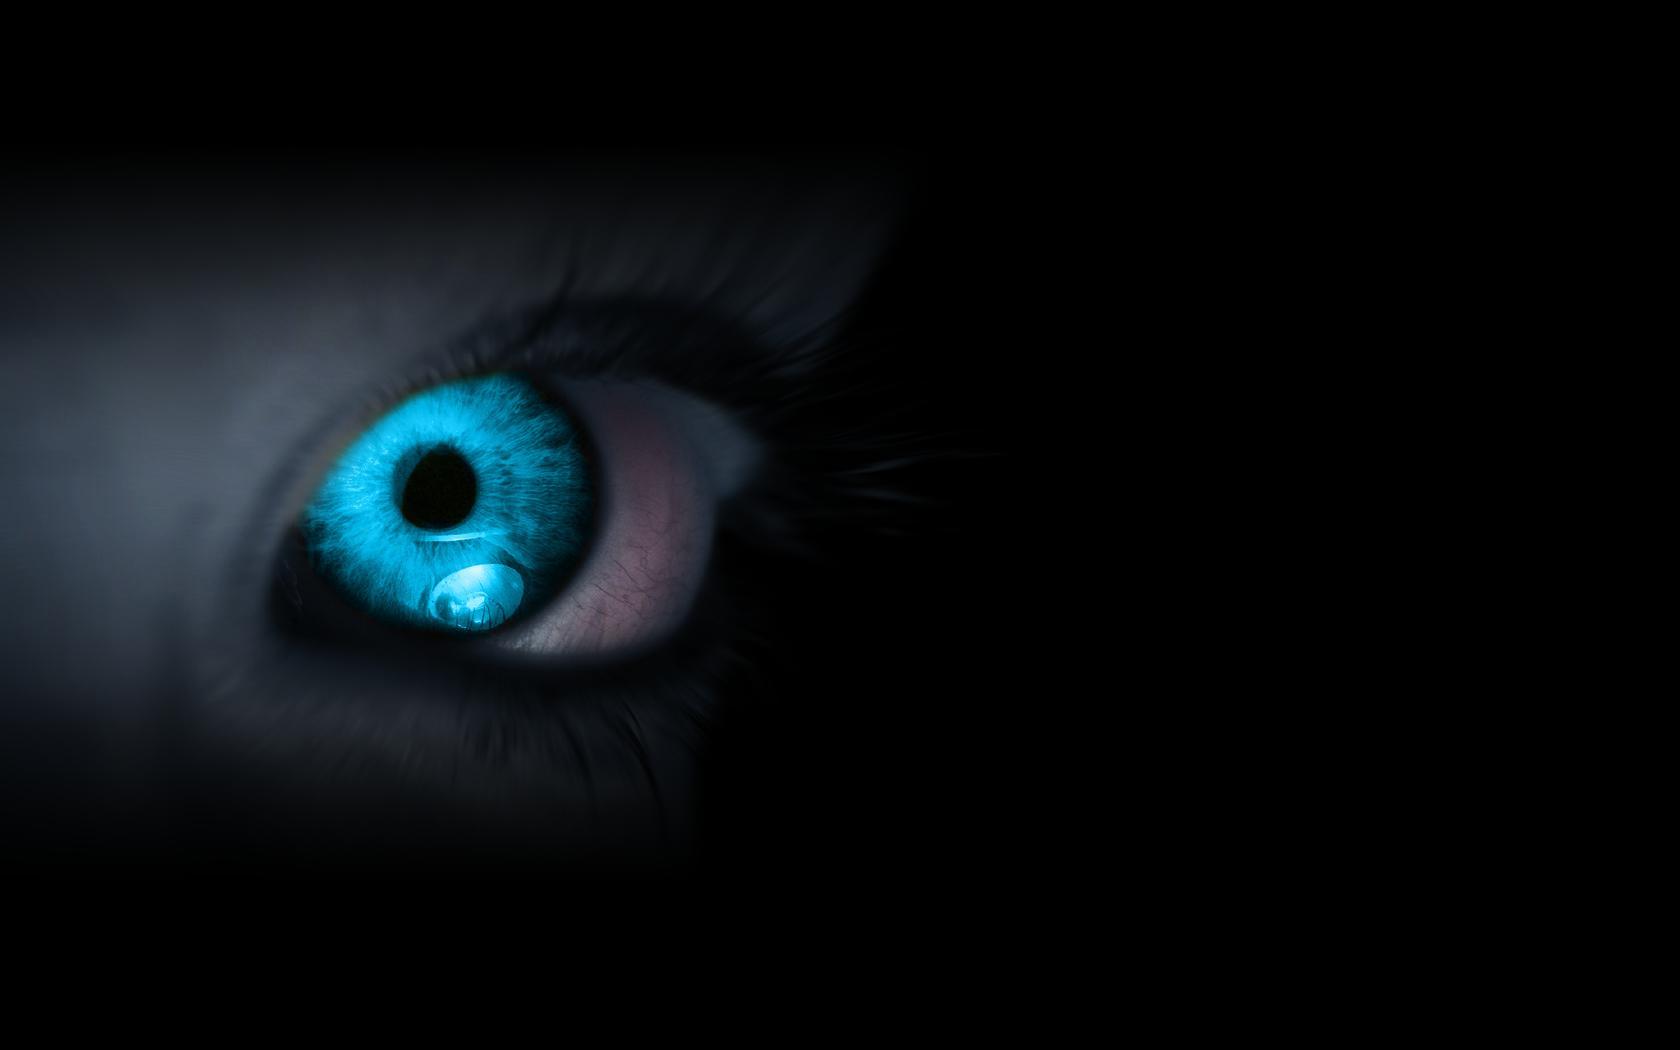 Hd Abstract Blue Eye Desktop Wallpaper Wallpapers Gallery 1680x1050